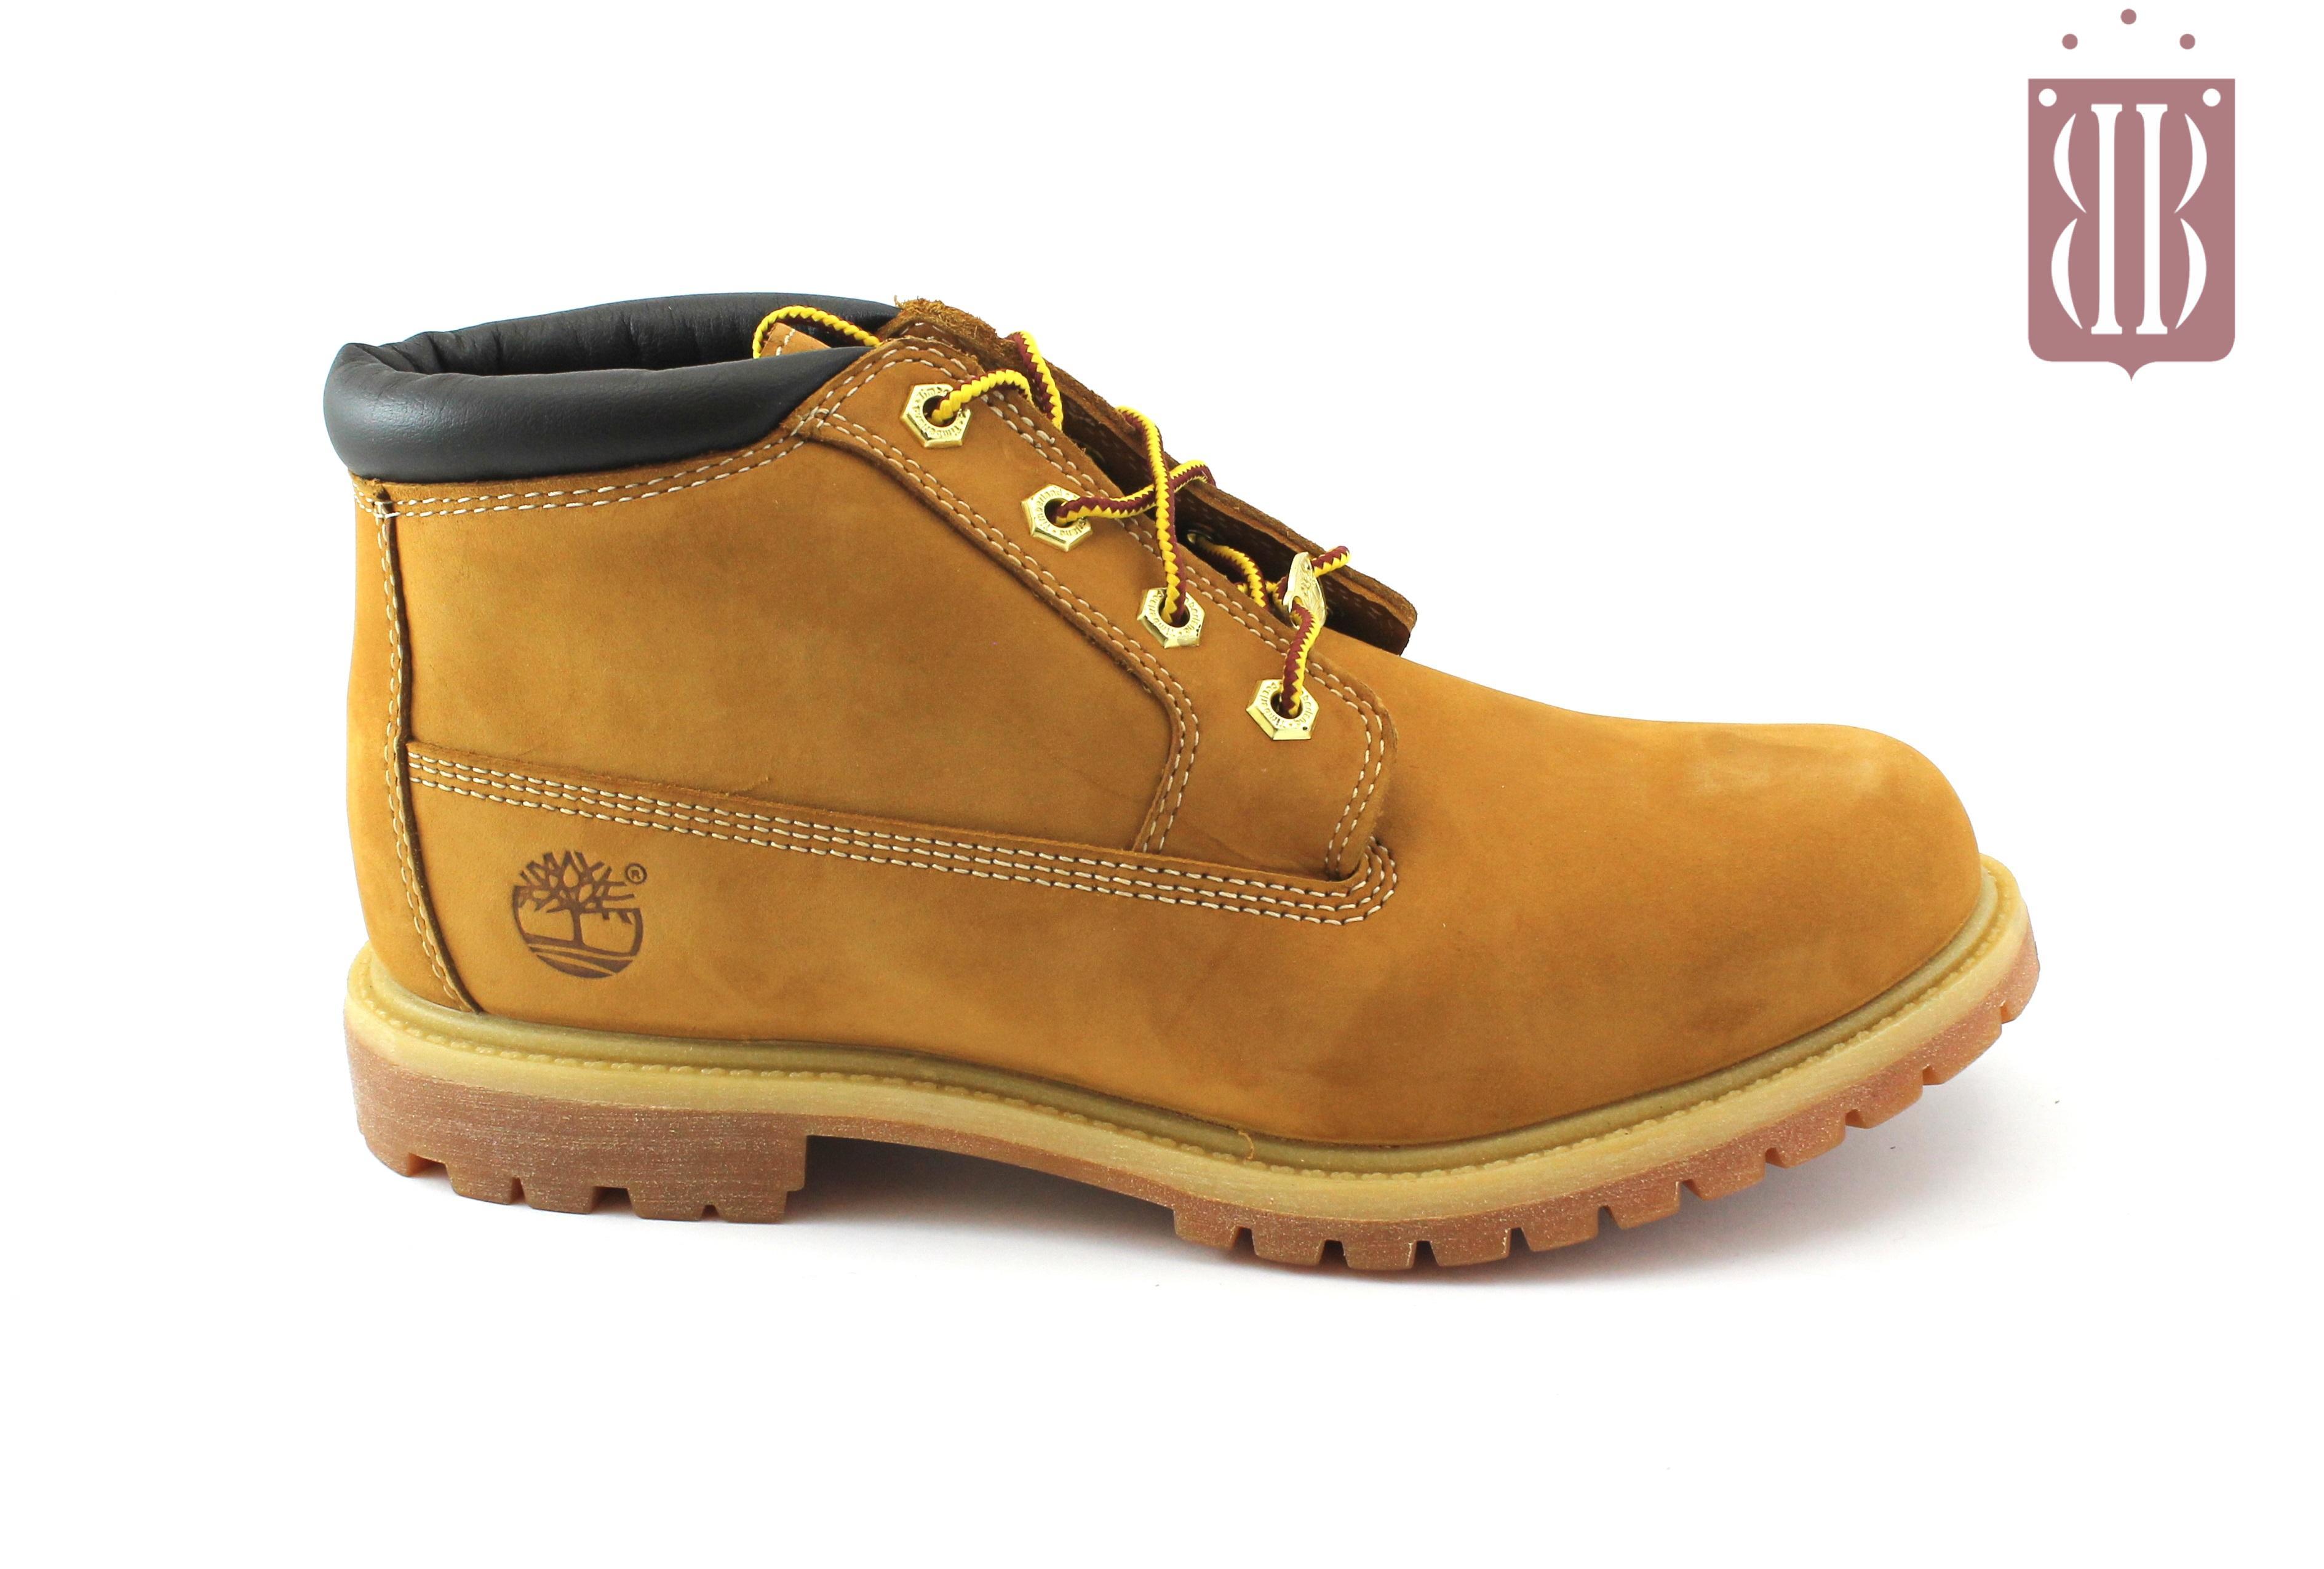 TIMBERLAND 23061 yellow giallo scarpe uomo scarponcini pelle waterproof